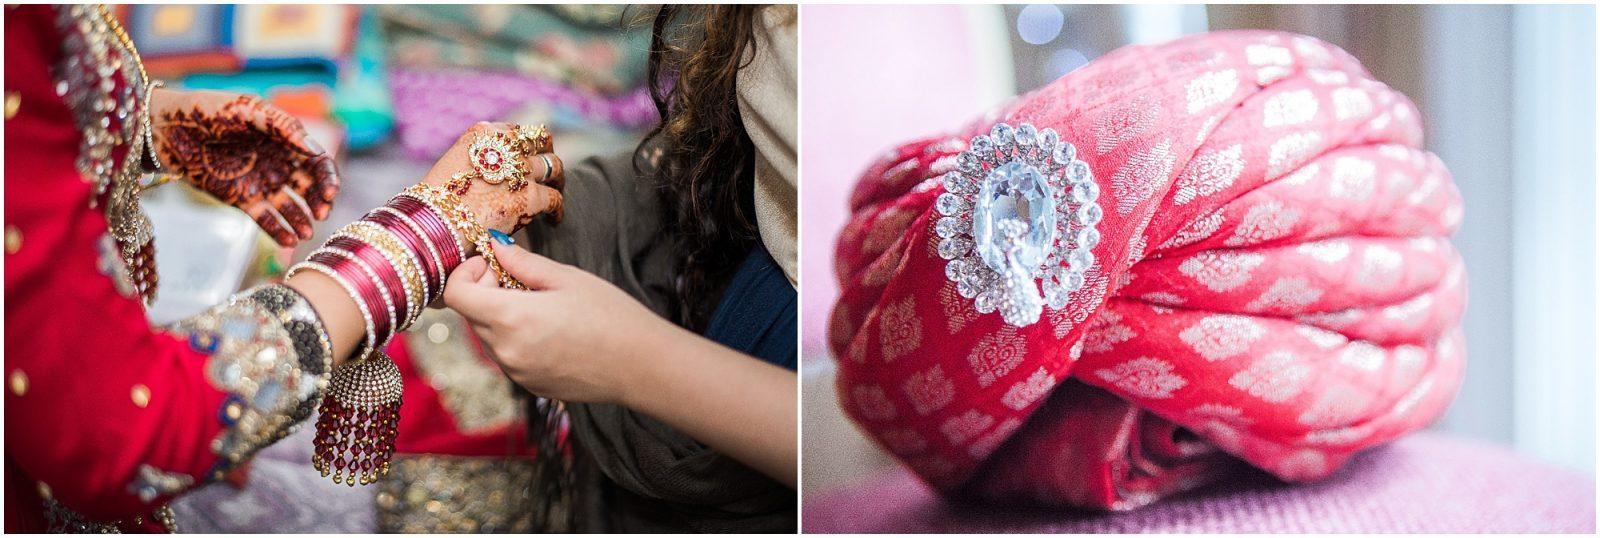 South Asian Wedding Toronto - Mehndi - Nikah, walima, indian wedding, pakistani wedding. Sarah & Sajid - bridal details, bride getting ready